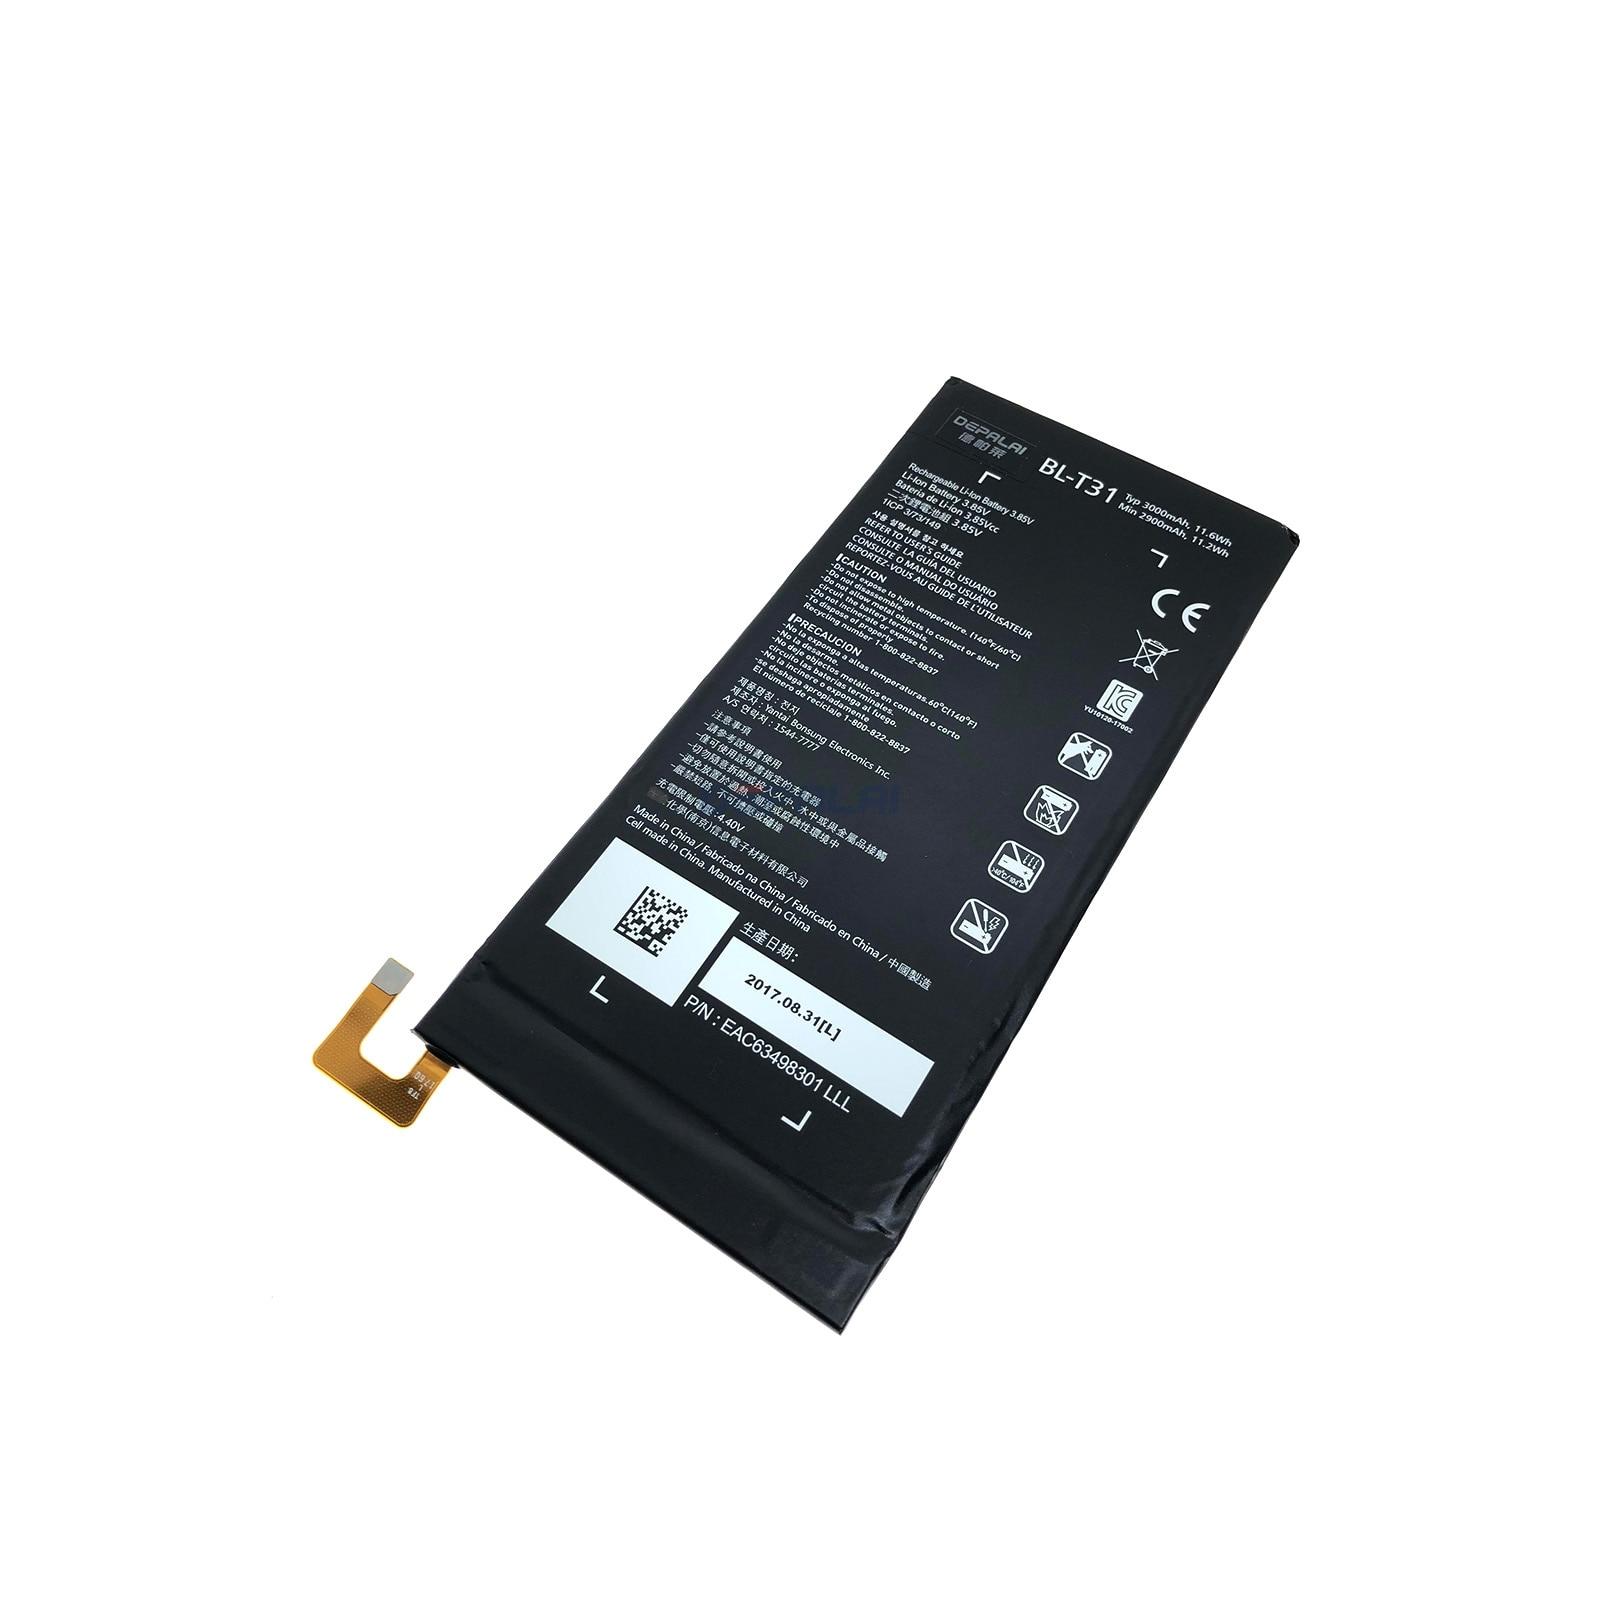 Bateria para lg g almofada f2 8.0 lk460 sprint BL-T31 3000mah